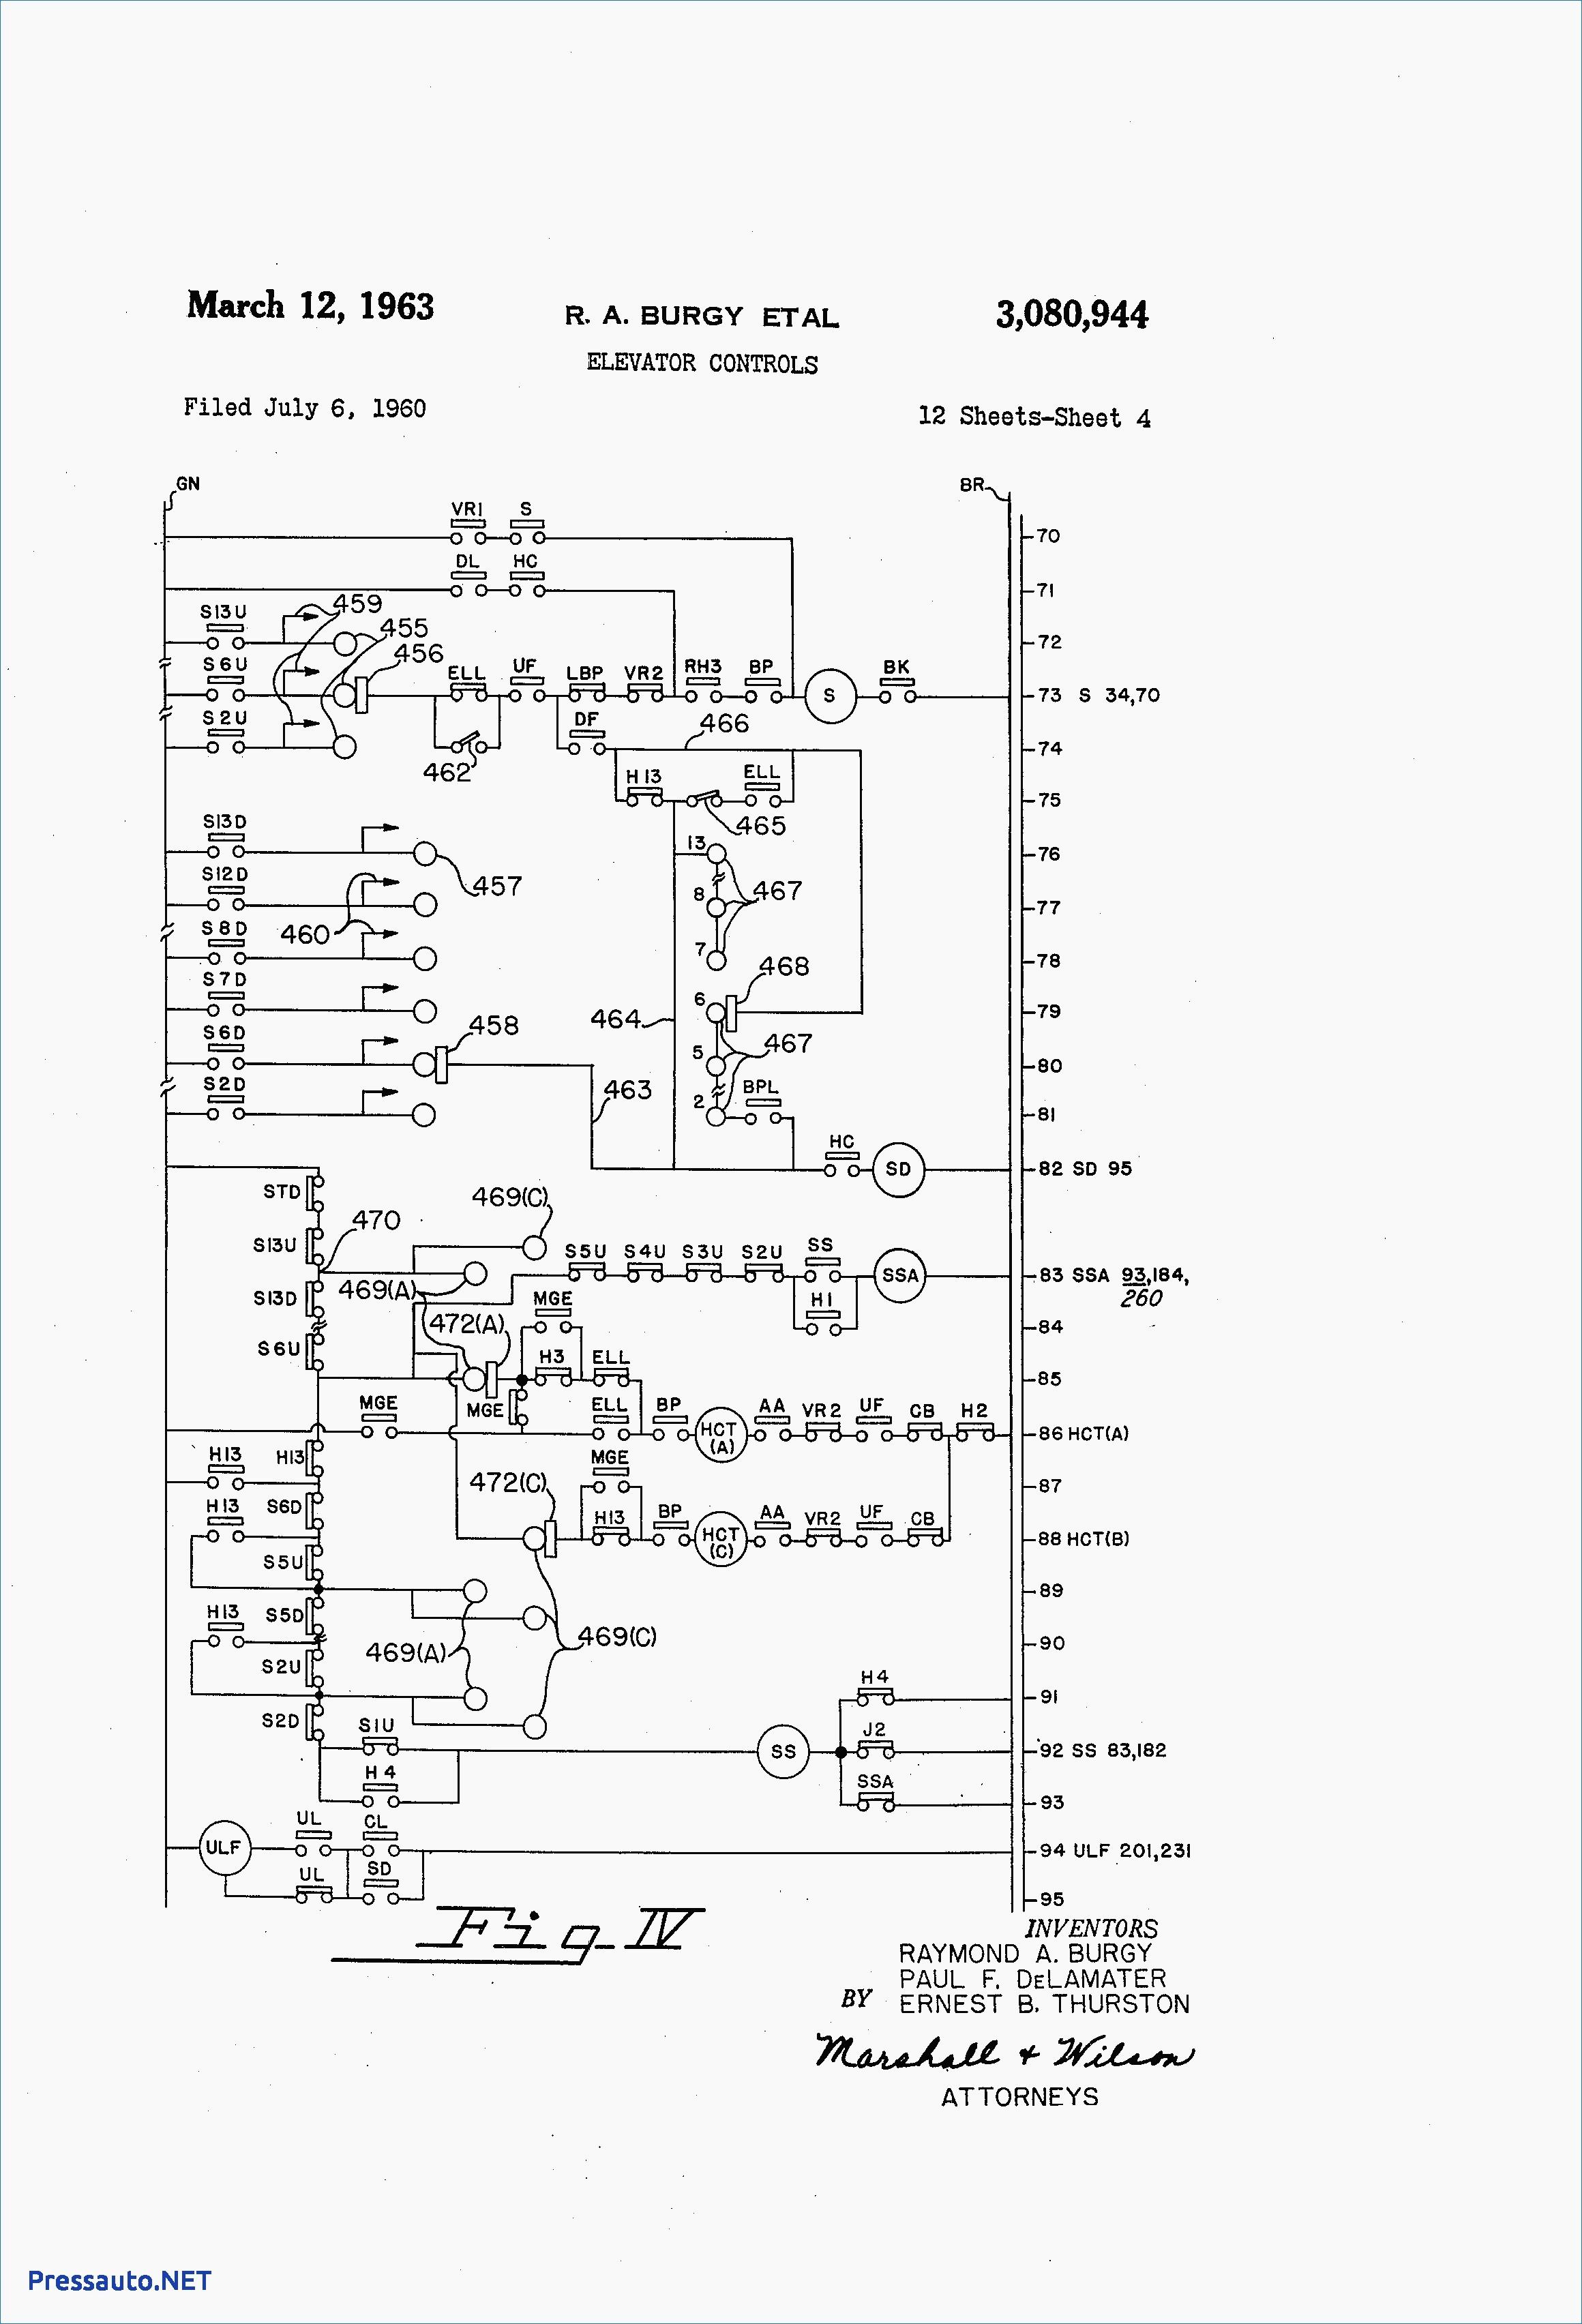 Square D Shunt Trip Breaker Wiring Diagram Square D Shunt Trip Breaker Wiring Diagram Ideas for Wiring Of Square D Shunt Trip Breaker Wiring Diagram